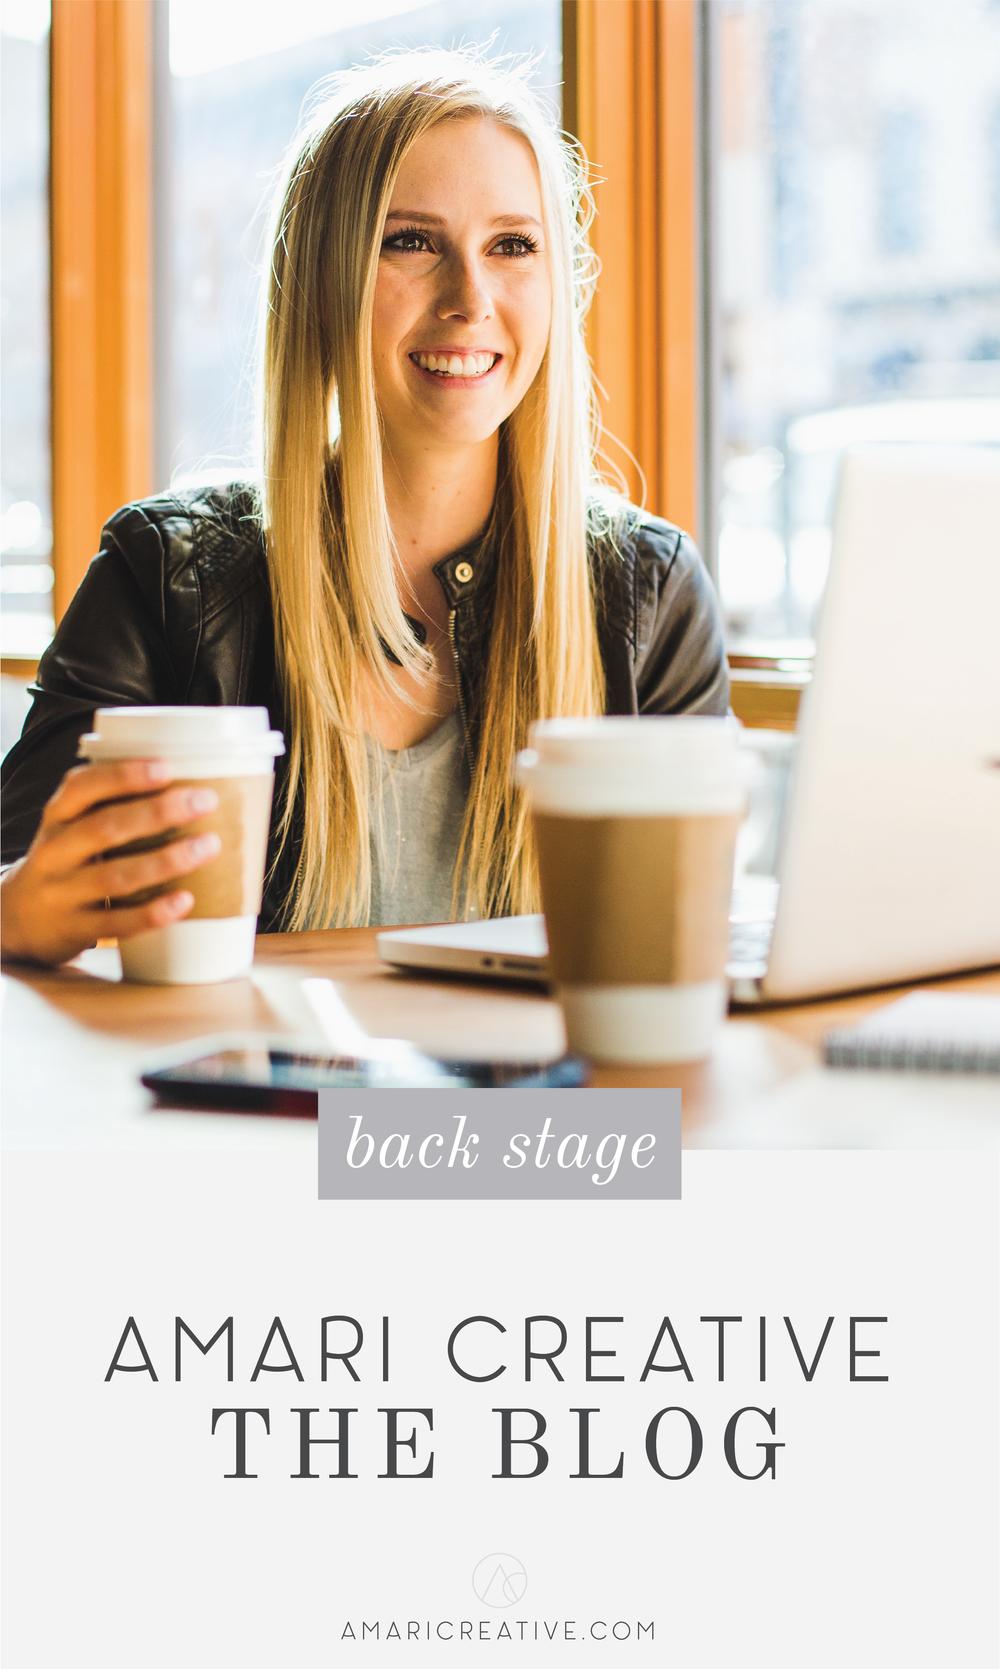 Welcome to the Amari Creative Blog!